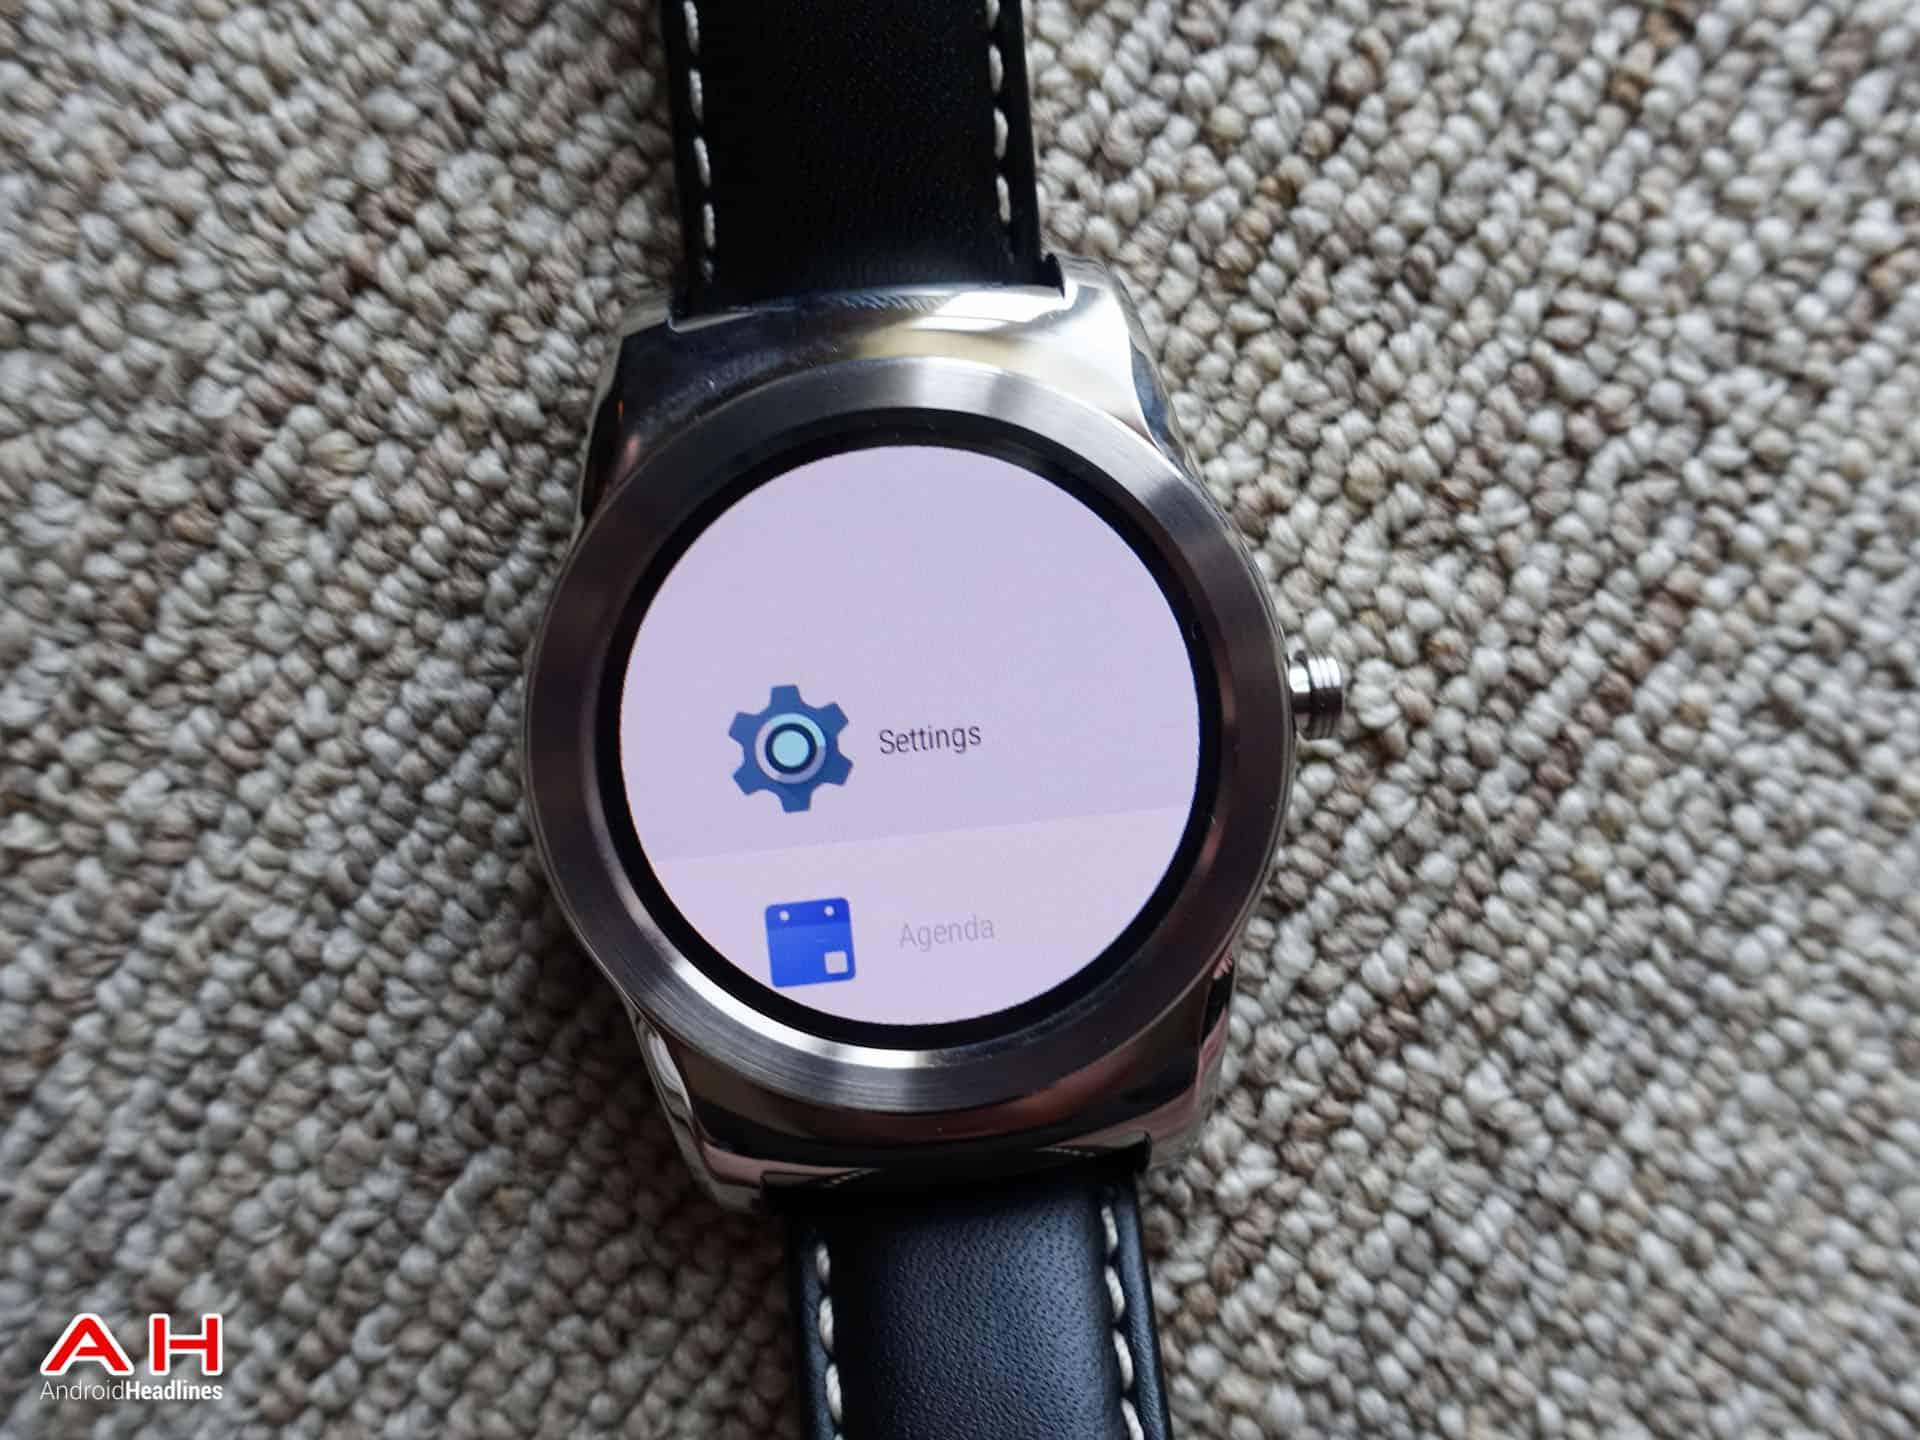 LG-Watch-Urbane-Review-AH-4